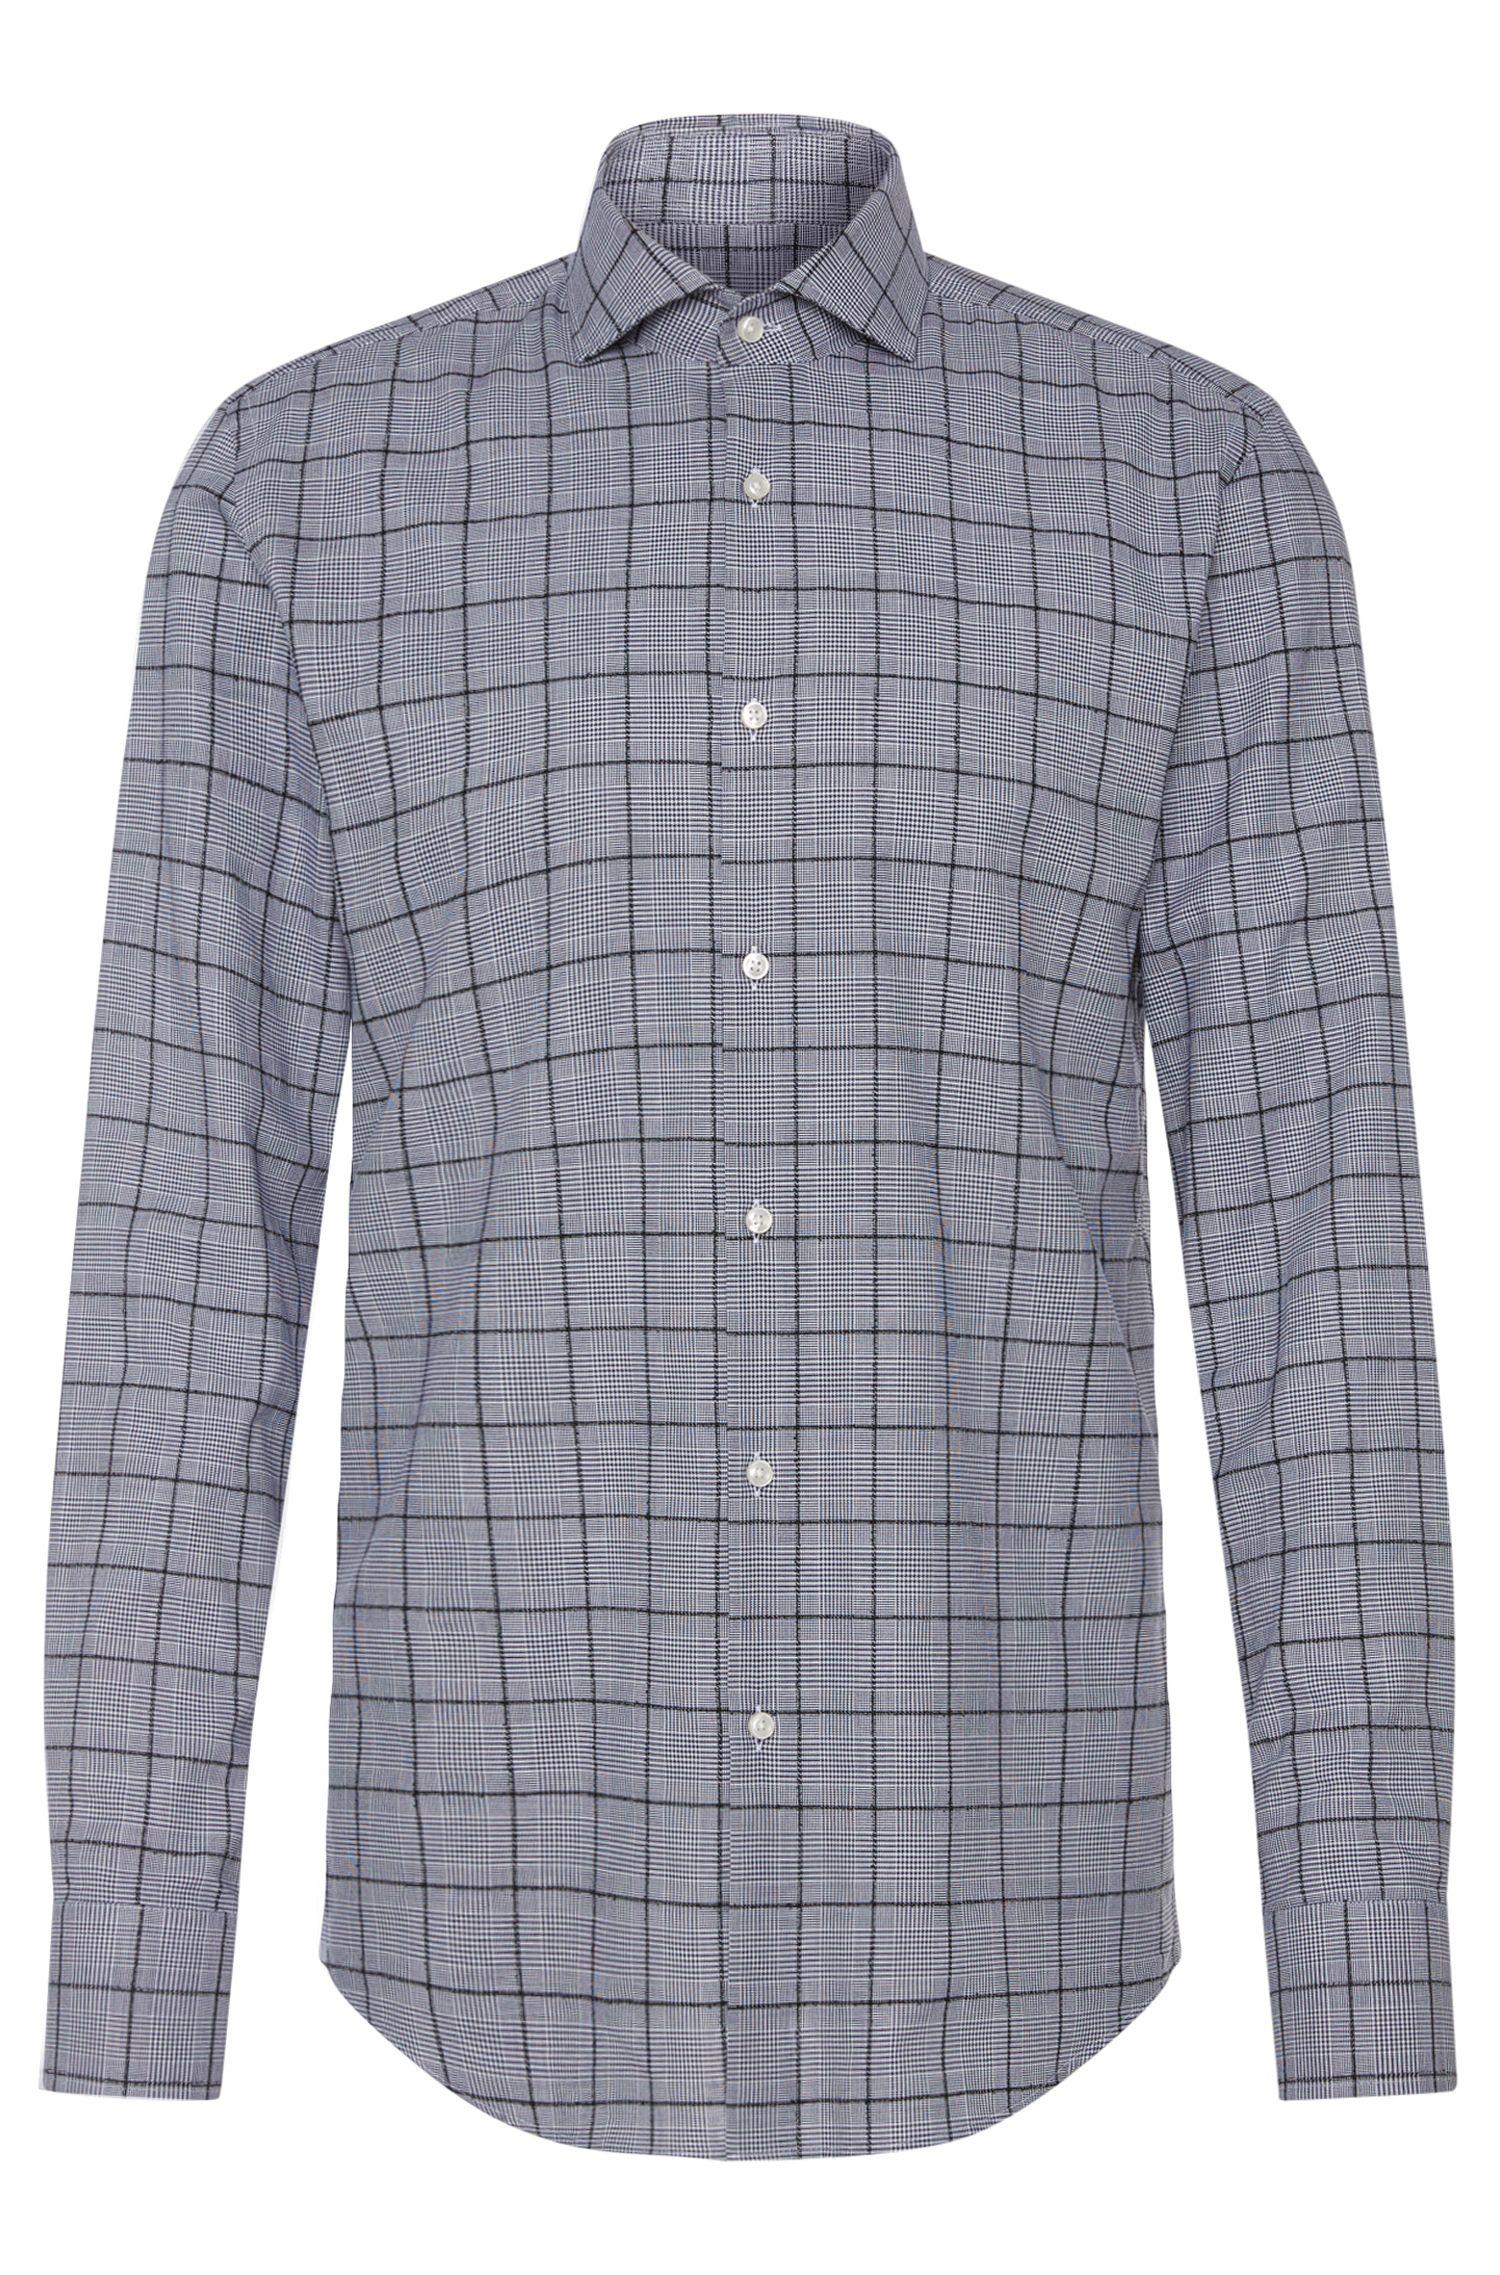 Plaid Italian Stretch Cotton Dress Shirt, Slim Fit | Jason